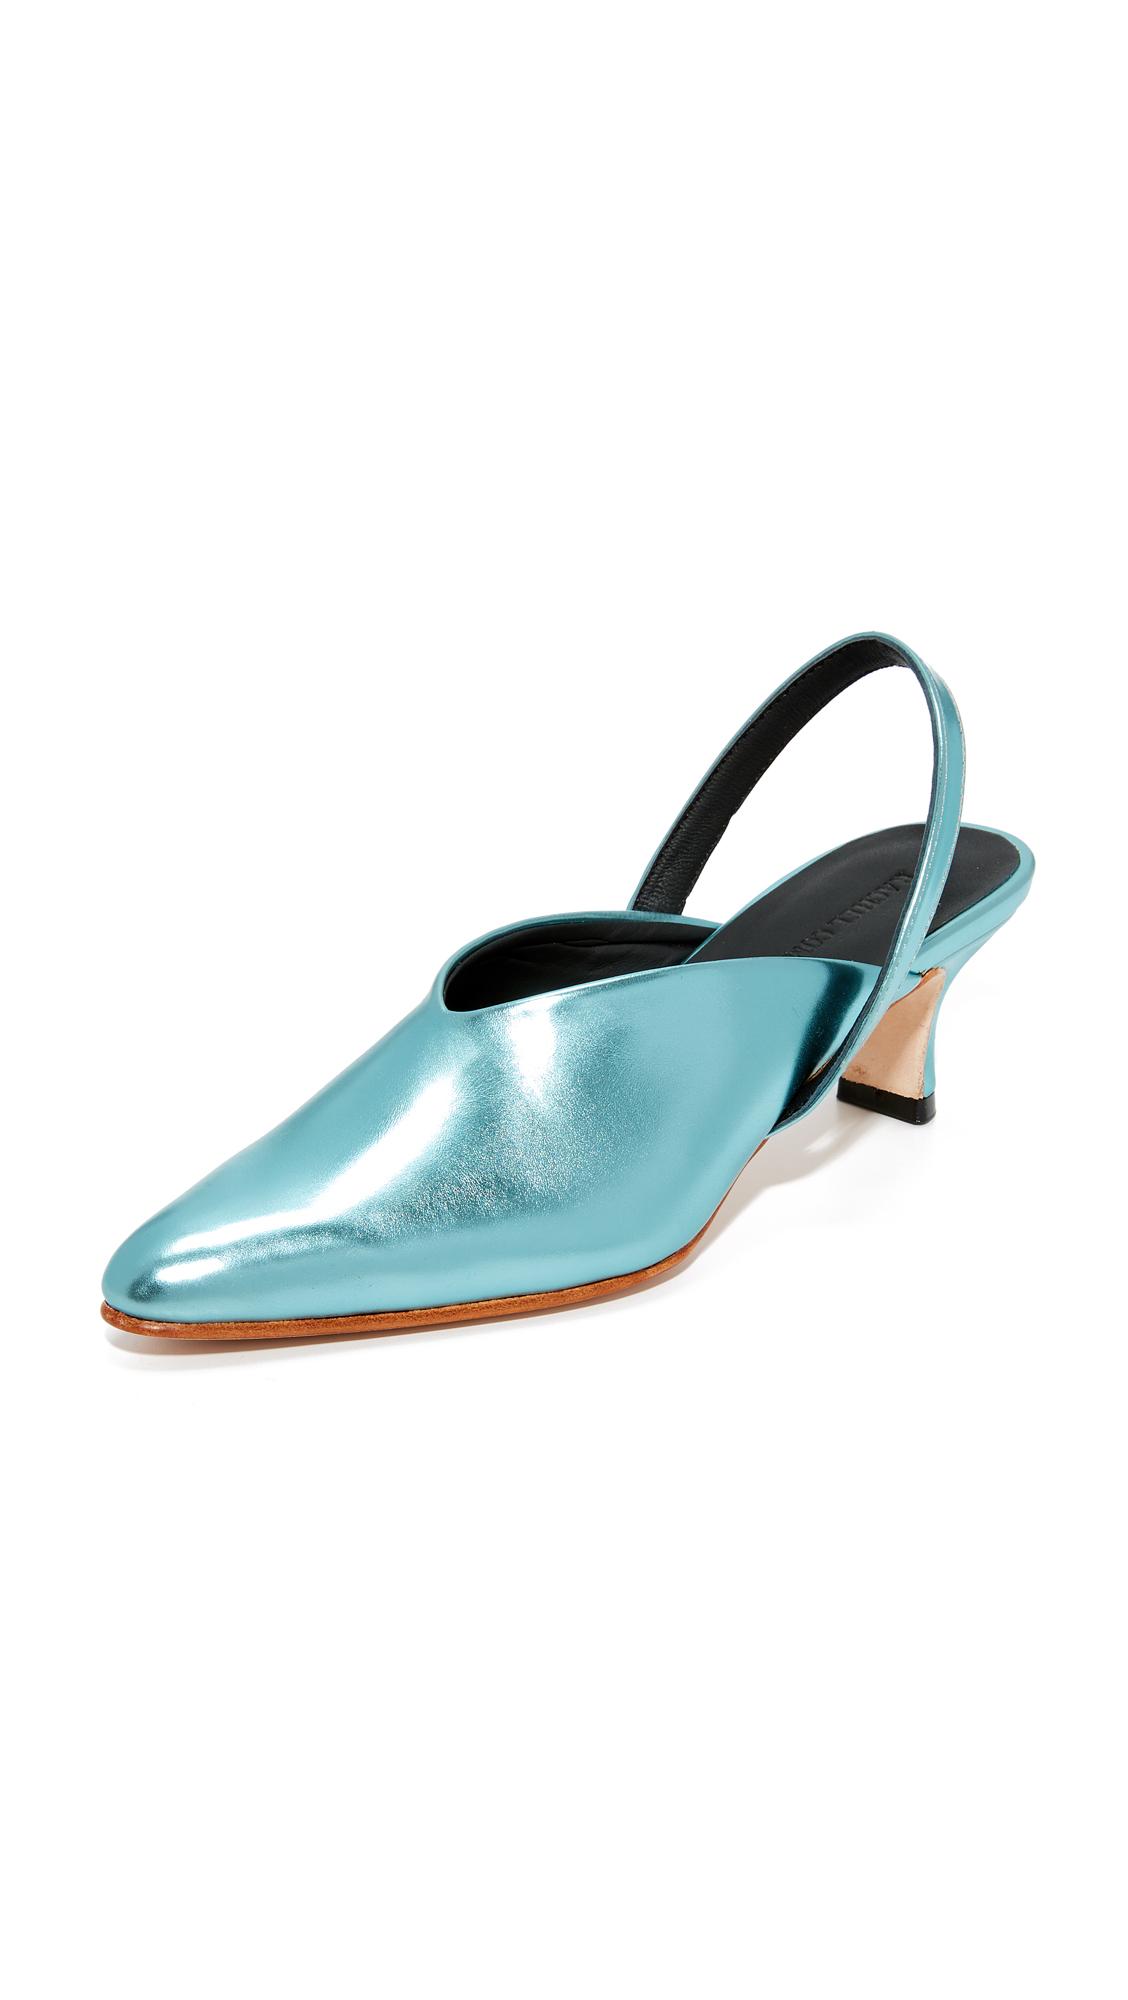 Rachel Comey Wext Slingback Pumps - Metallic Blue